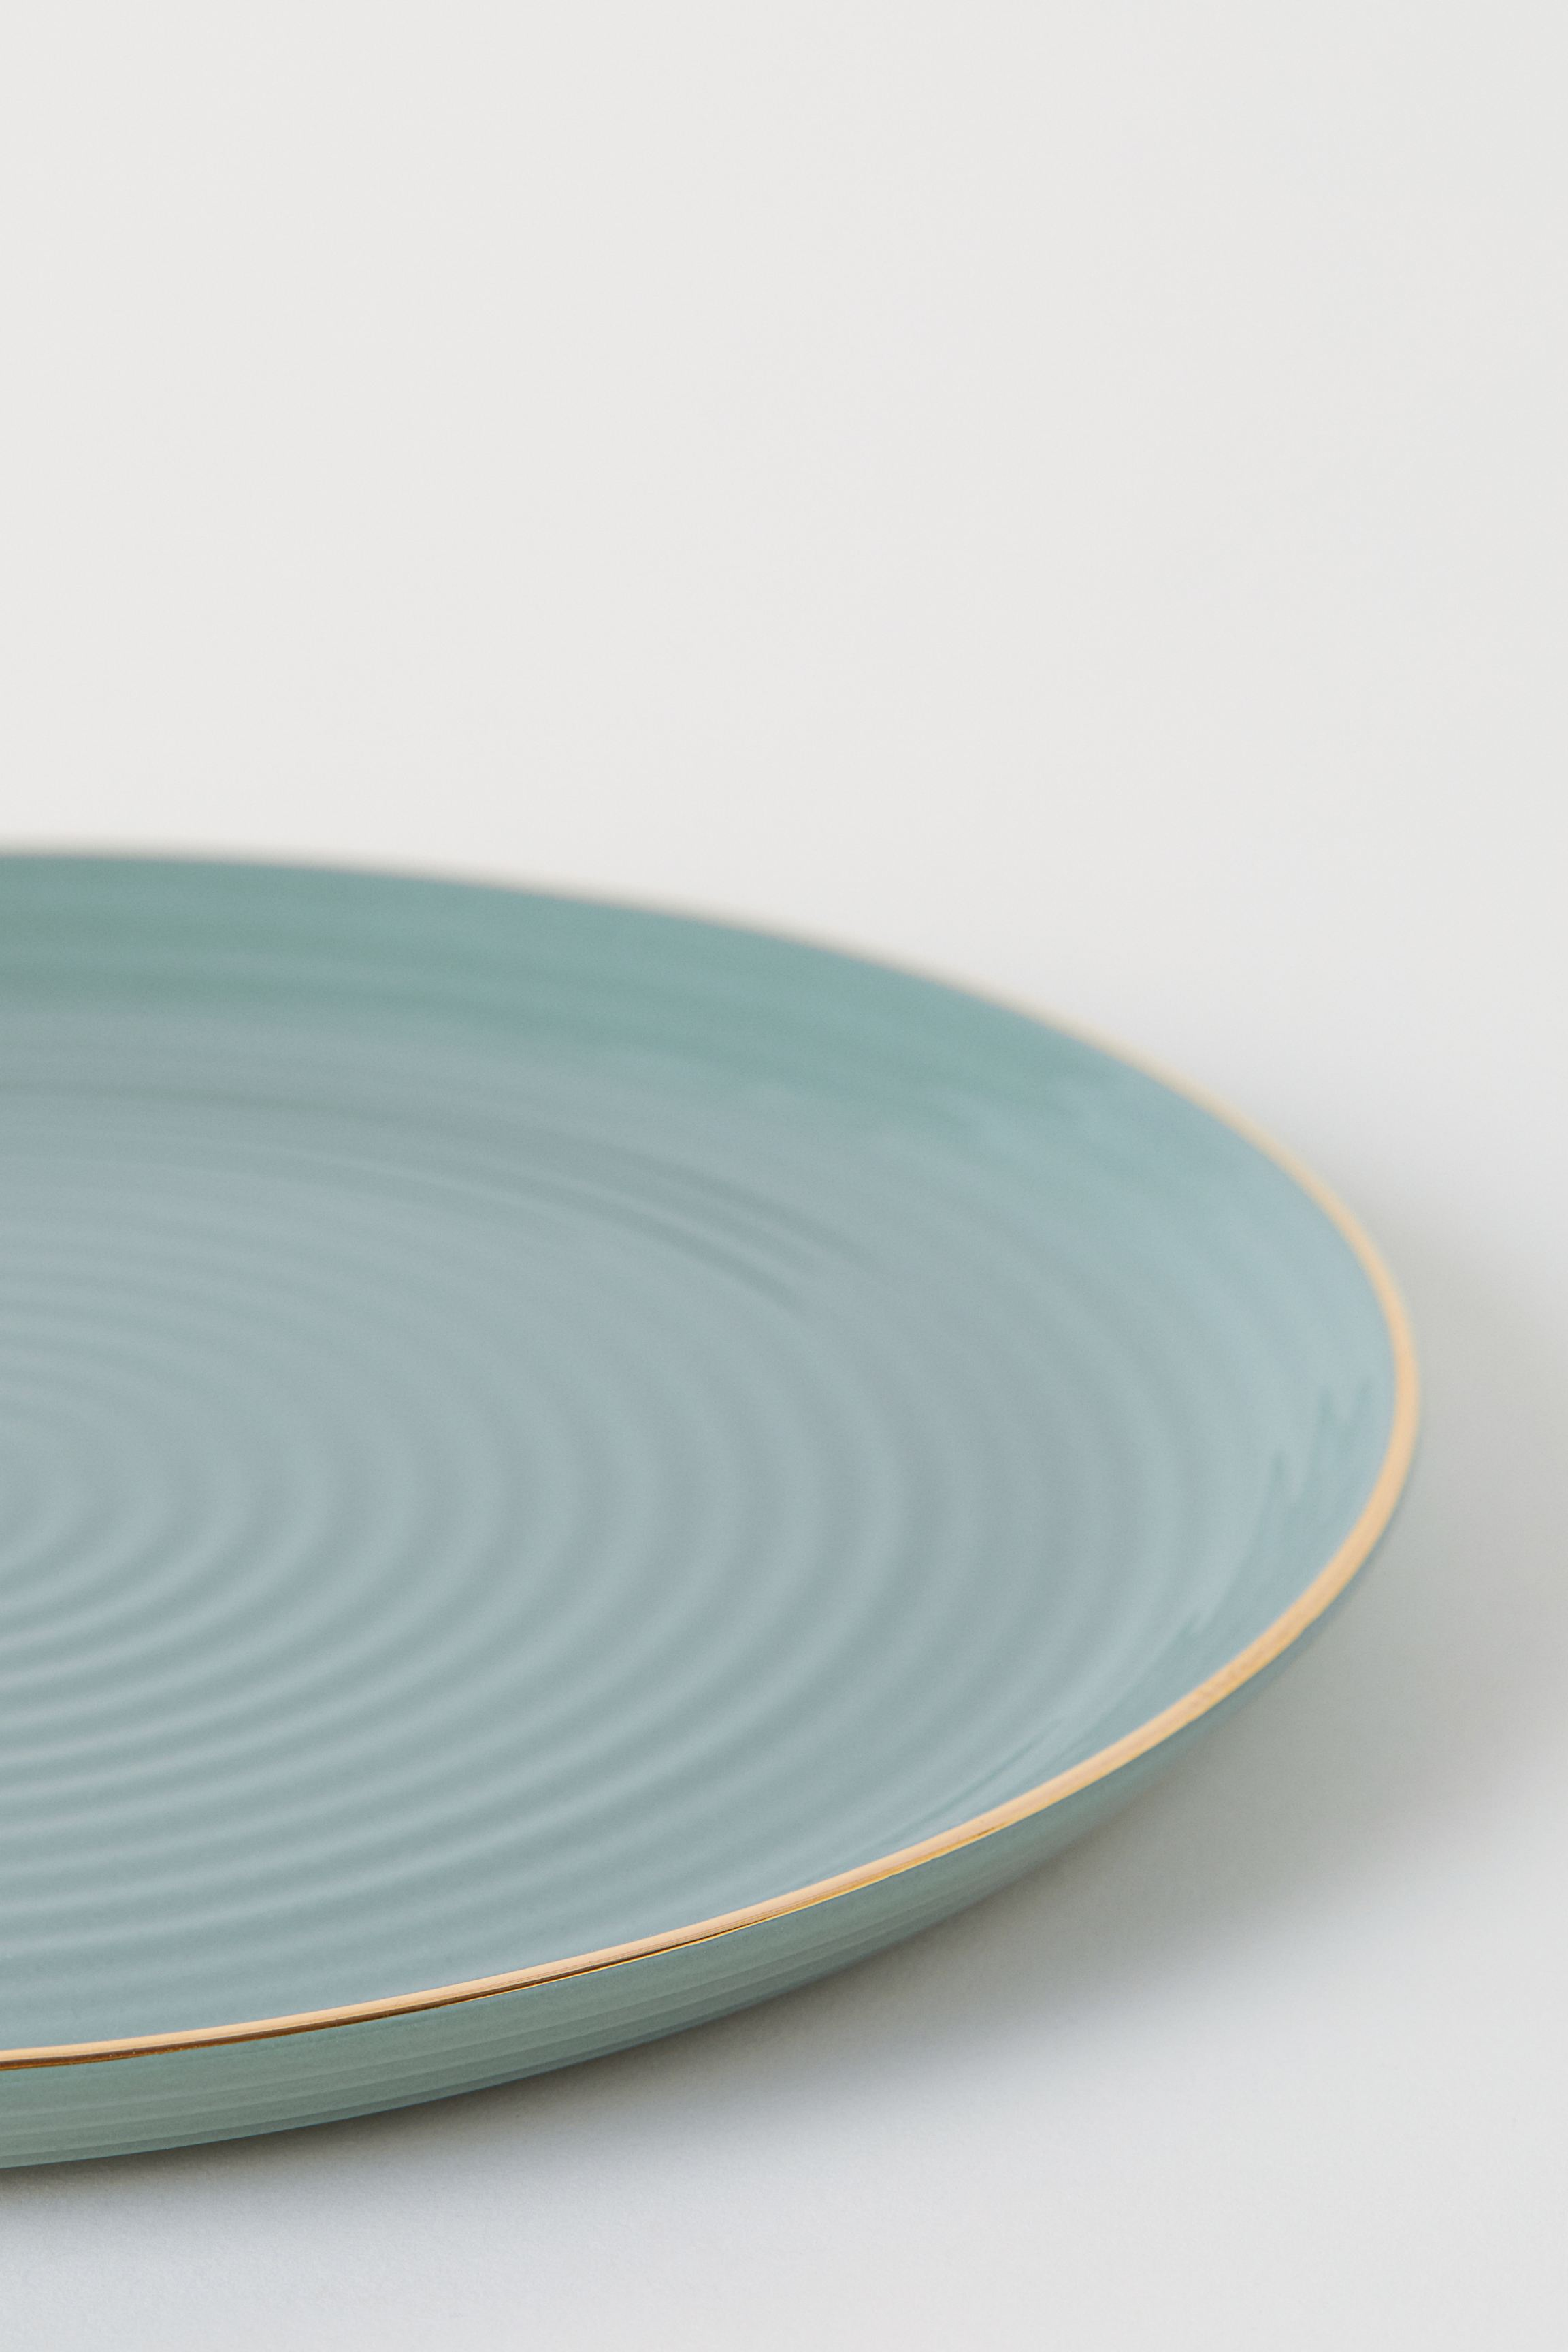 Textured Porcelain Dish